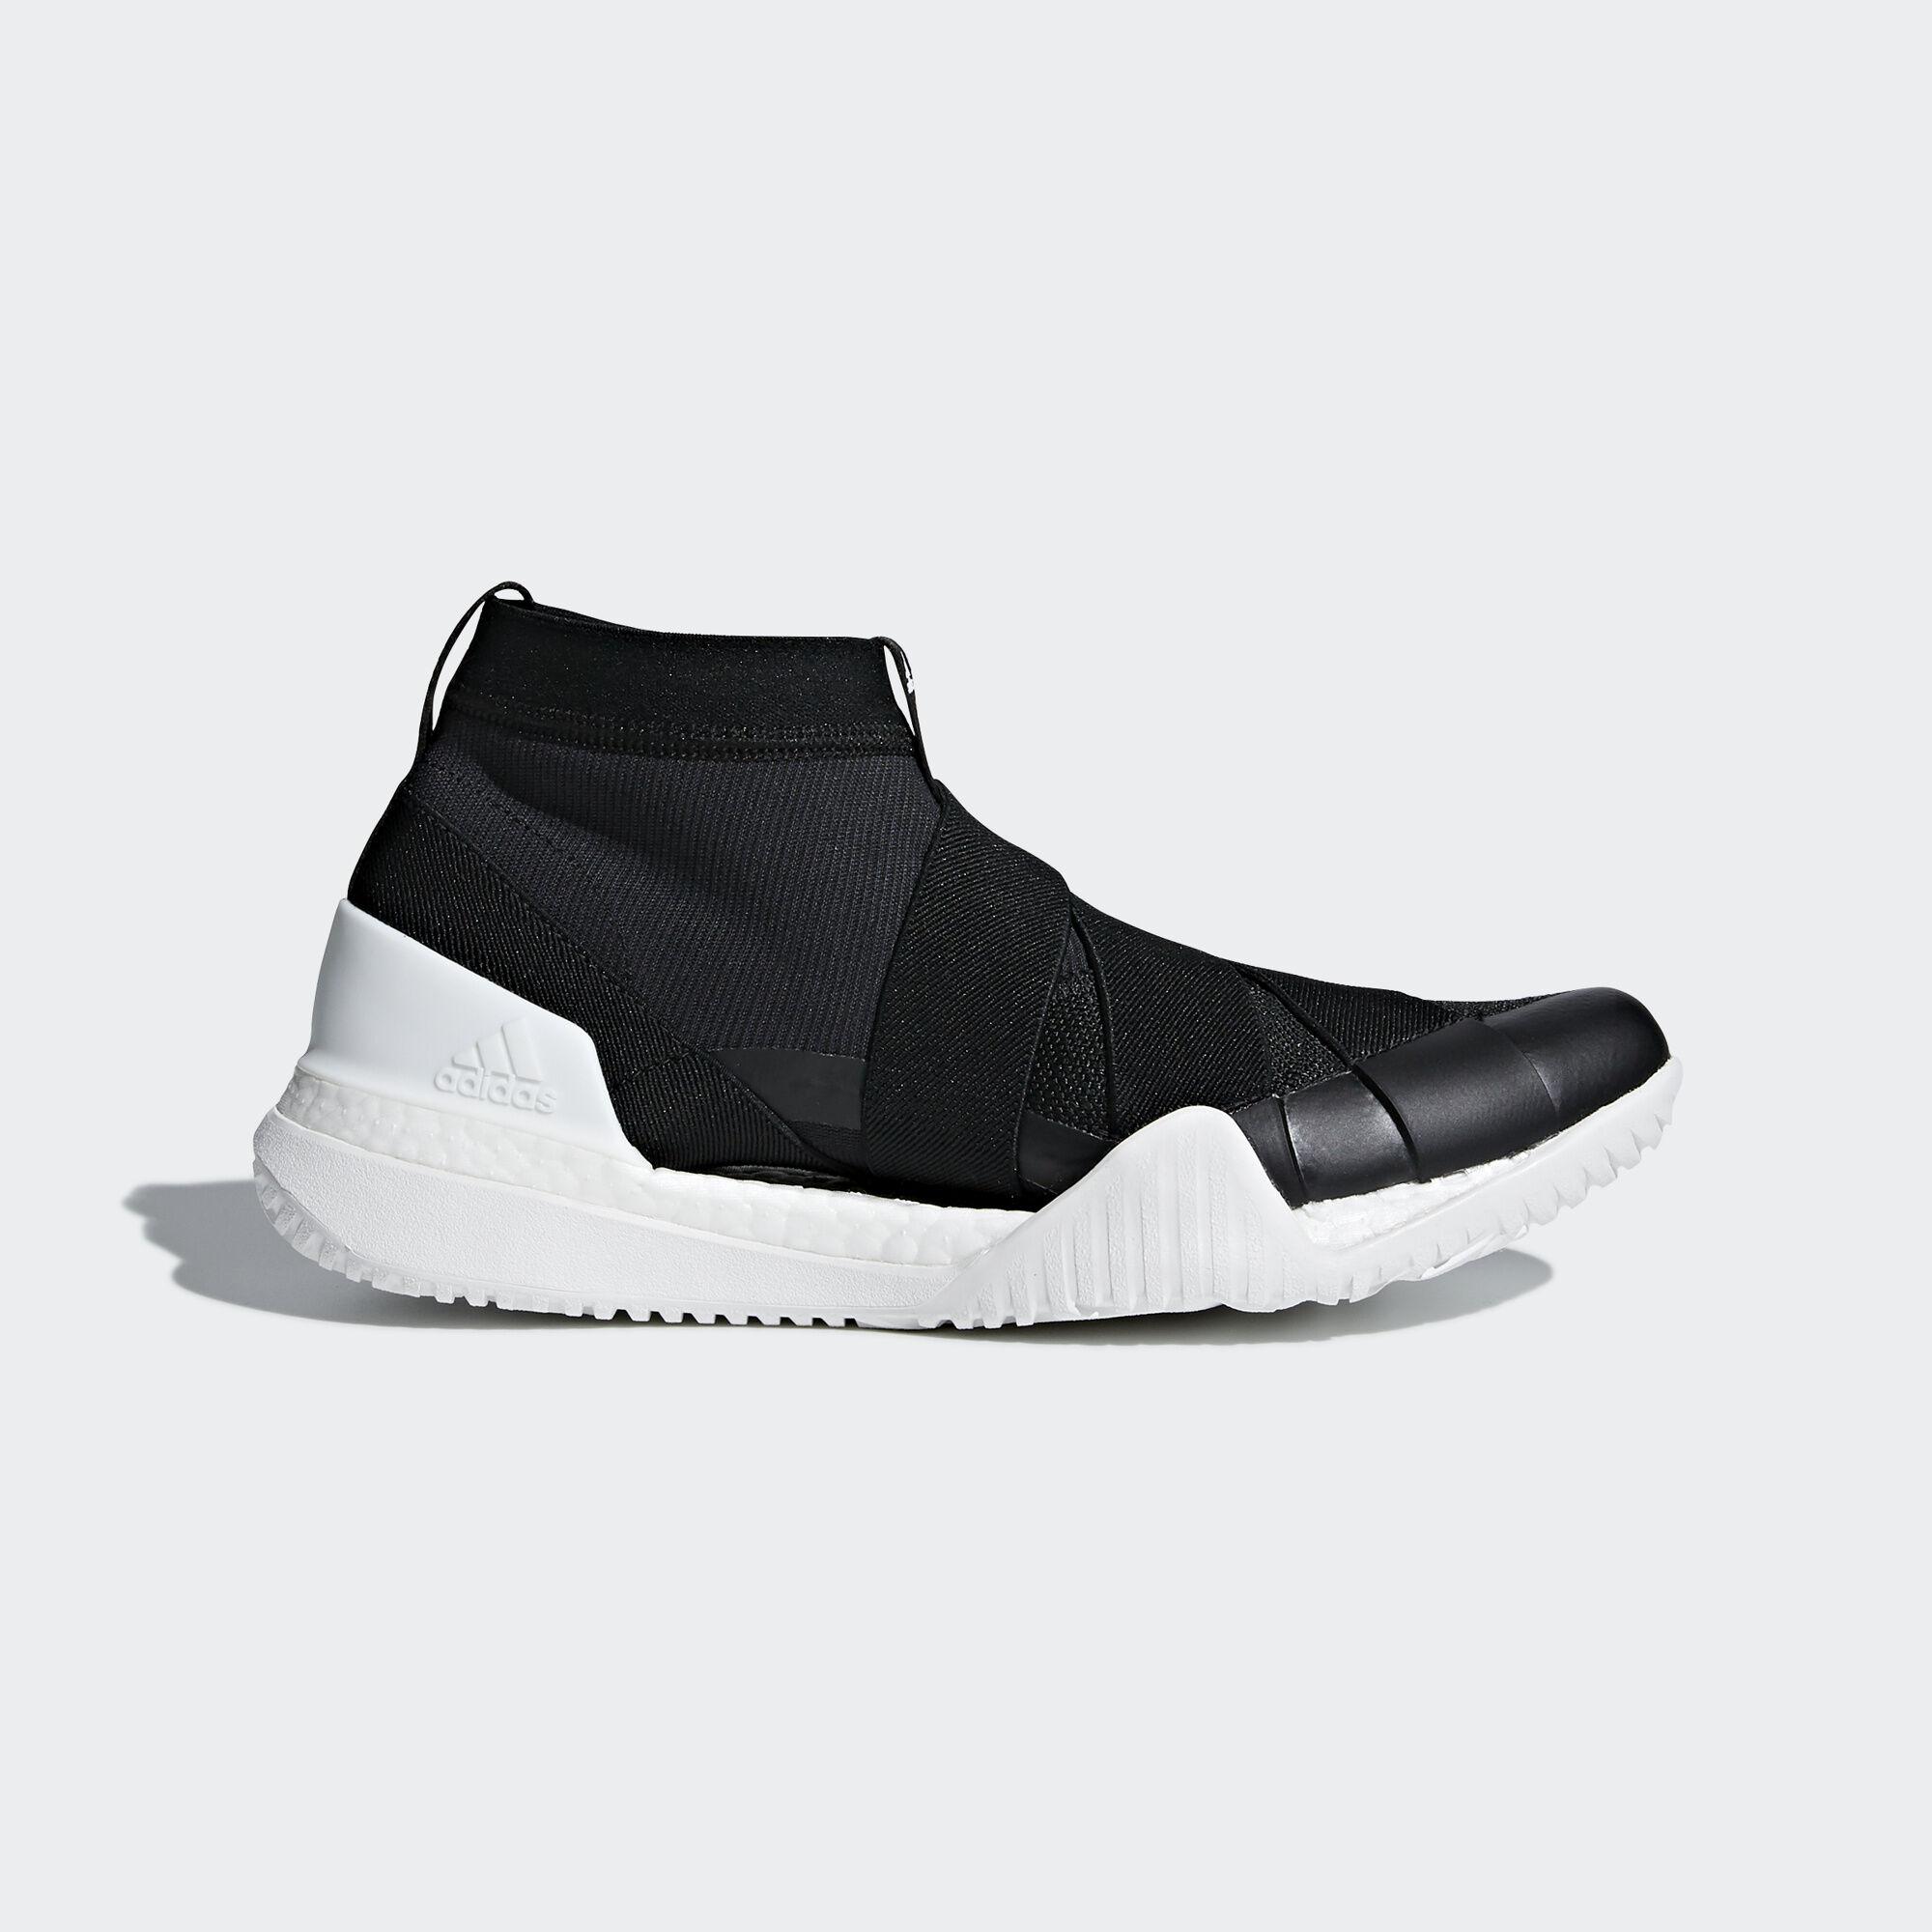 Adidas Pureboost X Training Shoes Women S Black